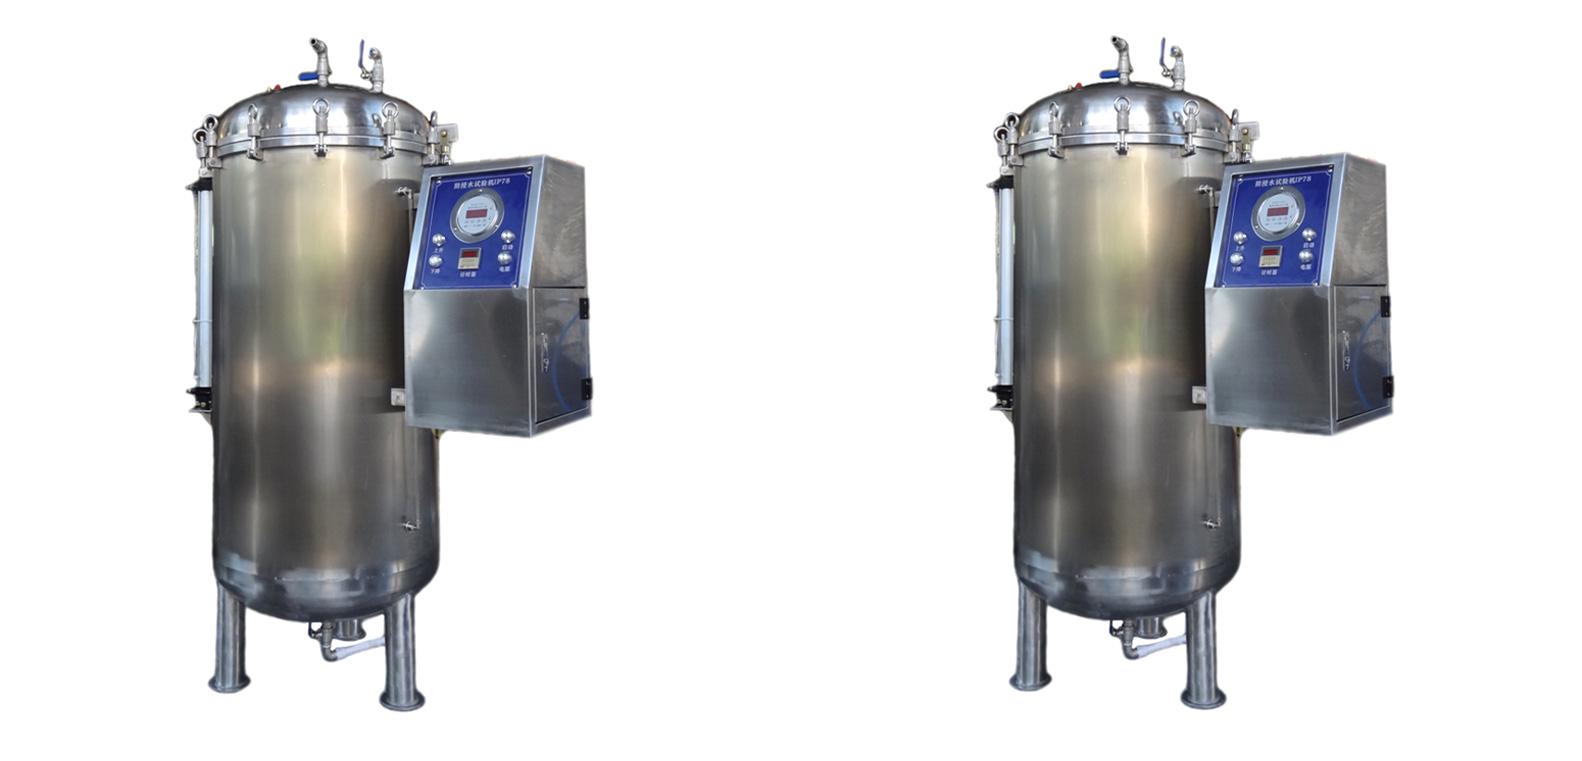 IP X7 X8 Pressurized Immersion Tank